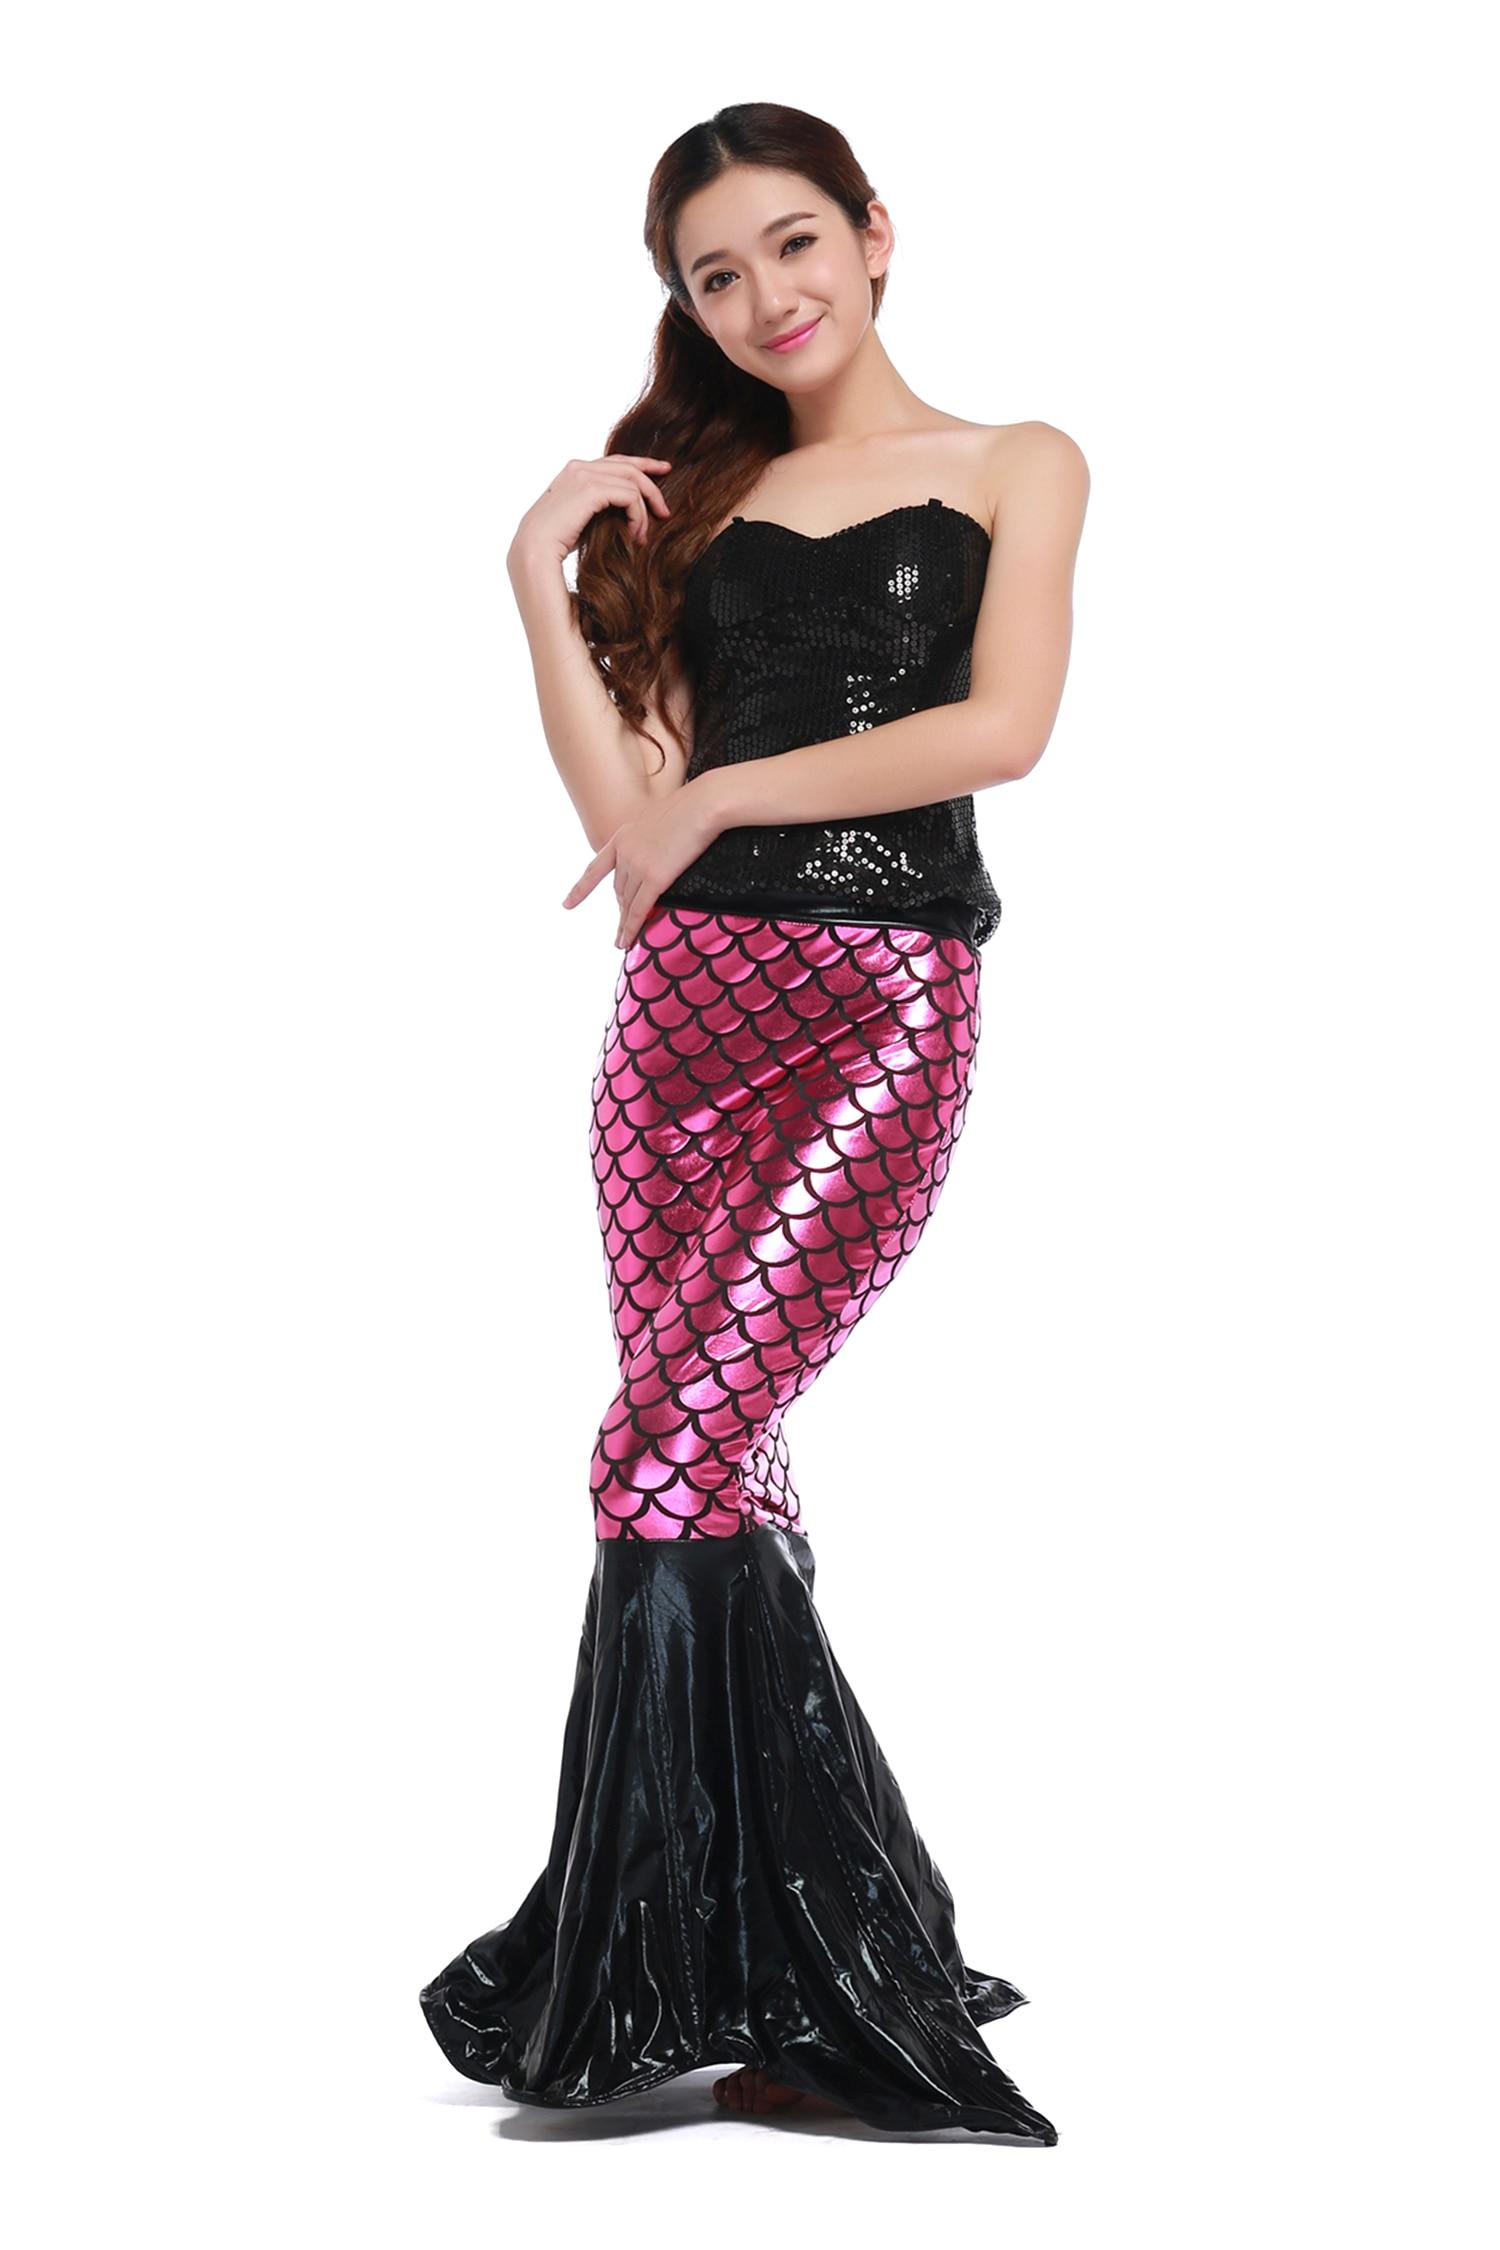 Mermaid Tail Long Dresses 2017 Adult Women Strapless